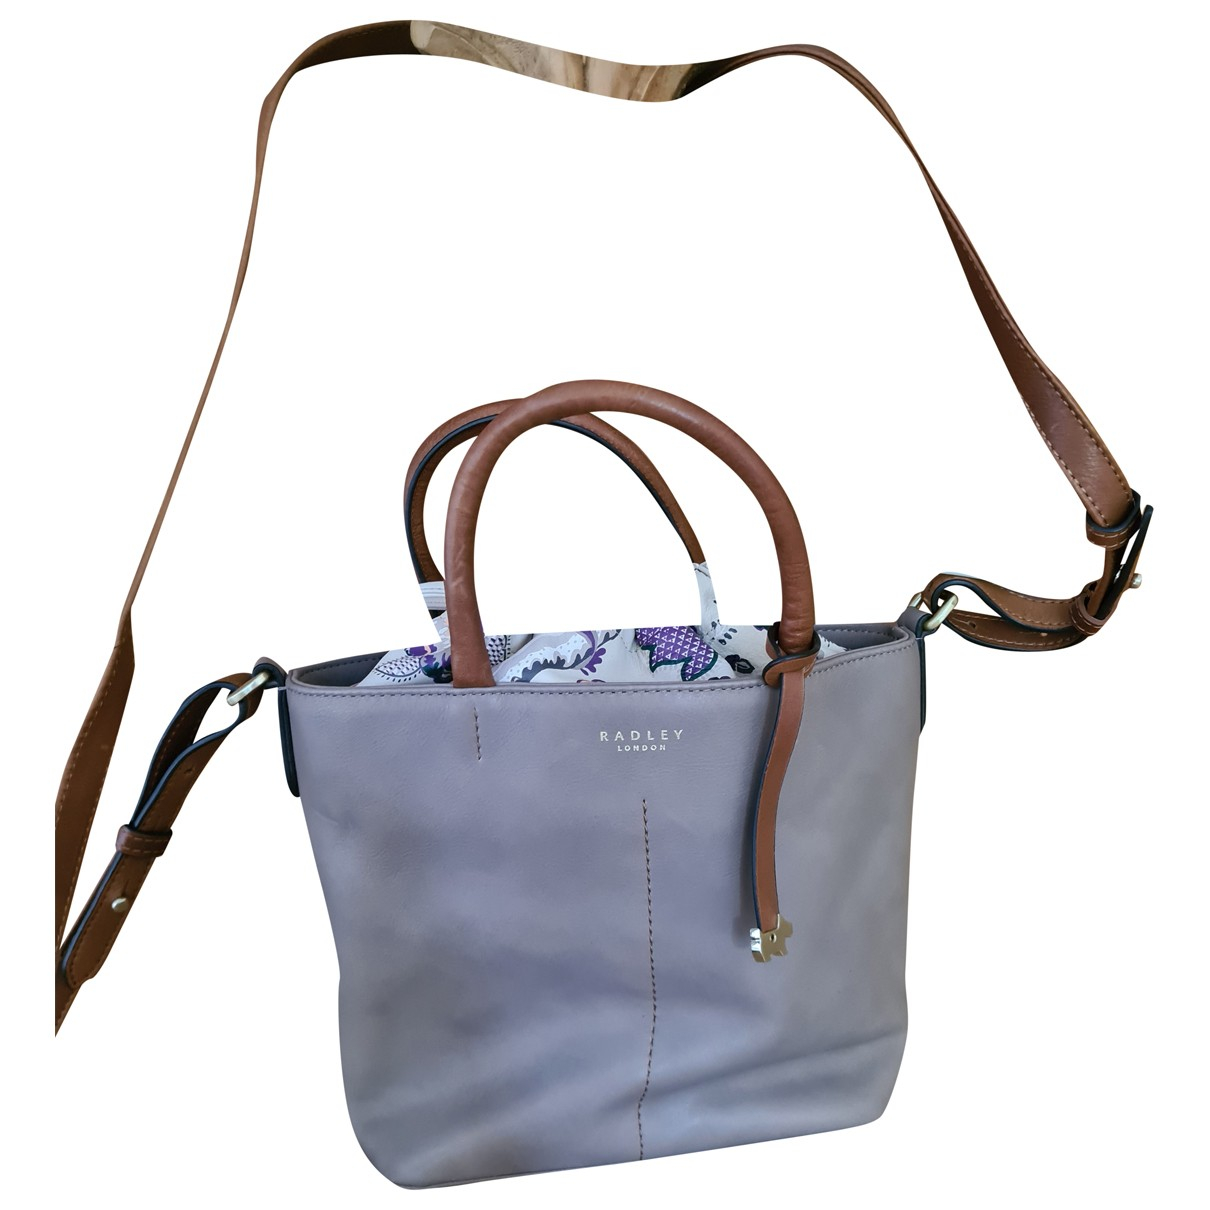 Radley London N Beige Leather handbag for Women N